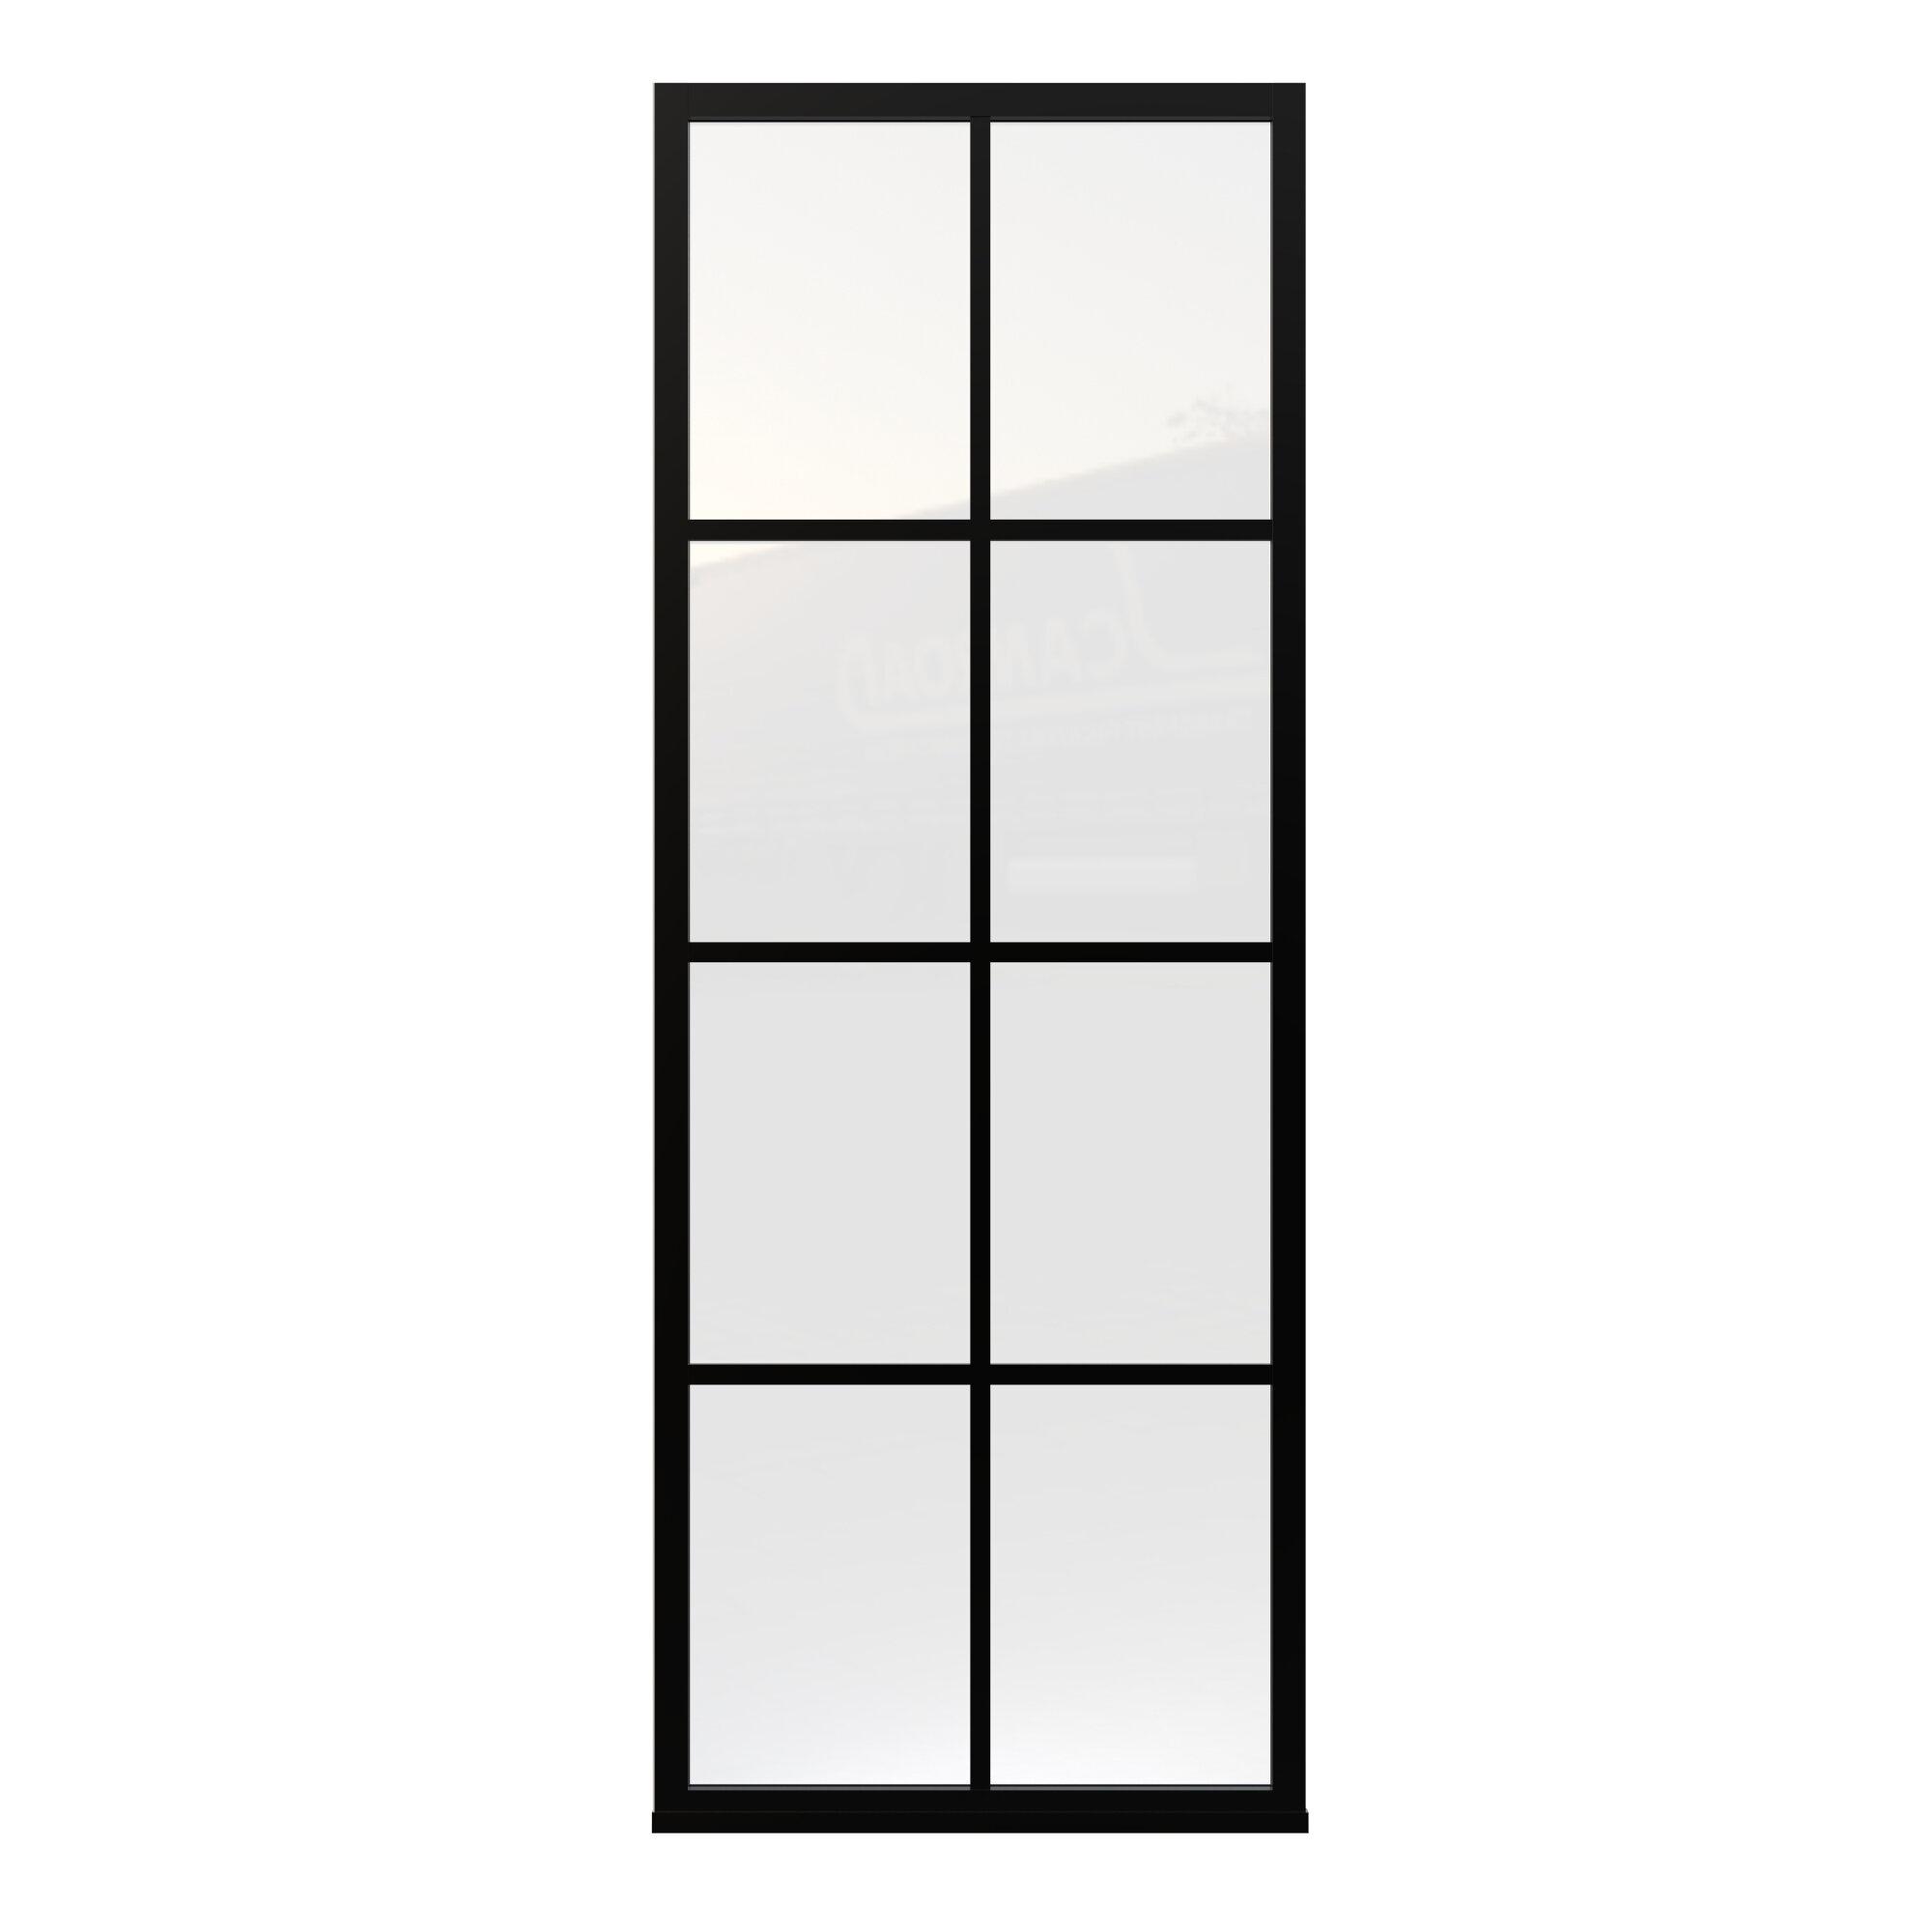 Coastal Industries Gridscape Series 32 X 70 Framed Shower Door Wayfair,Ikea Closet Organizer Hanging